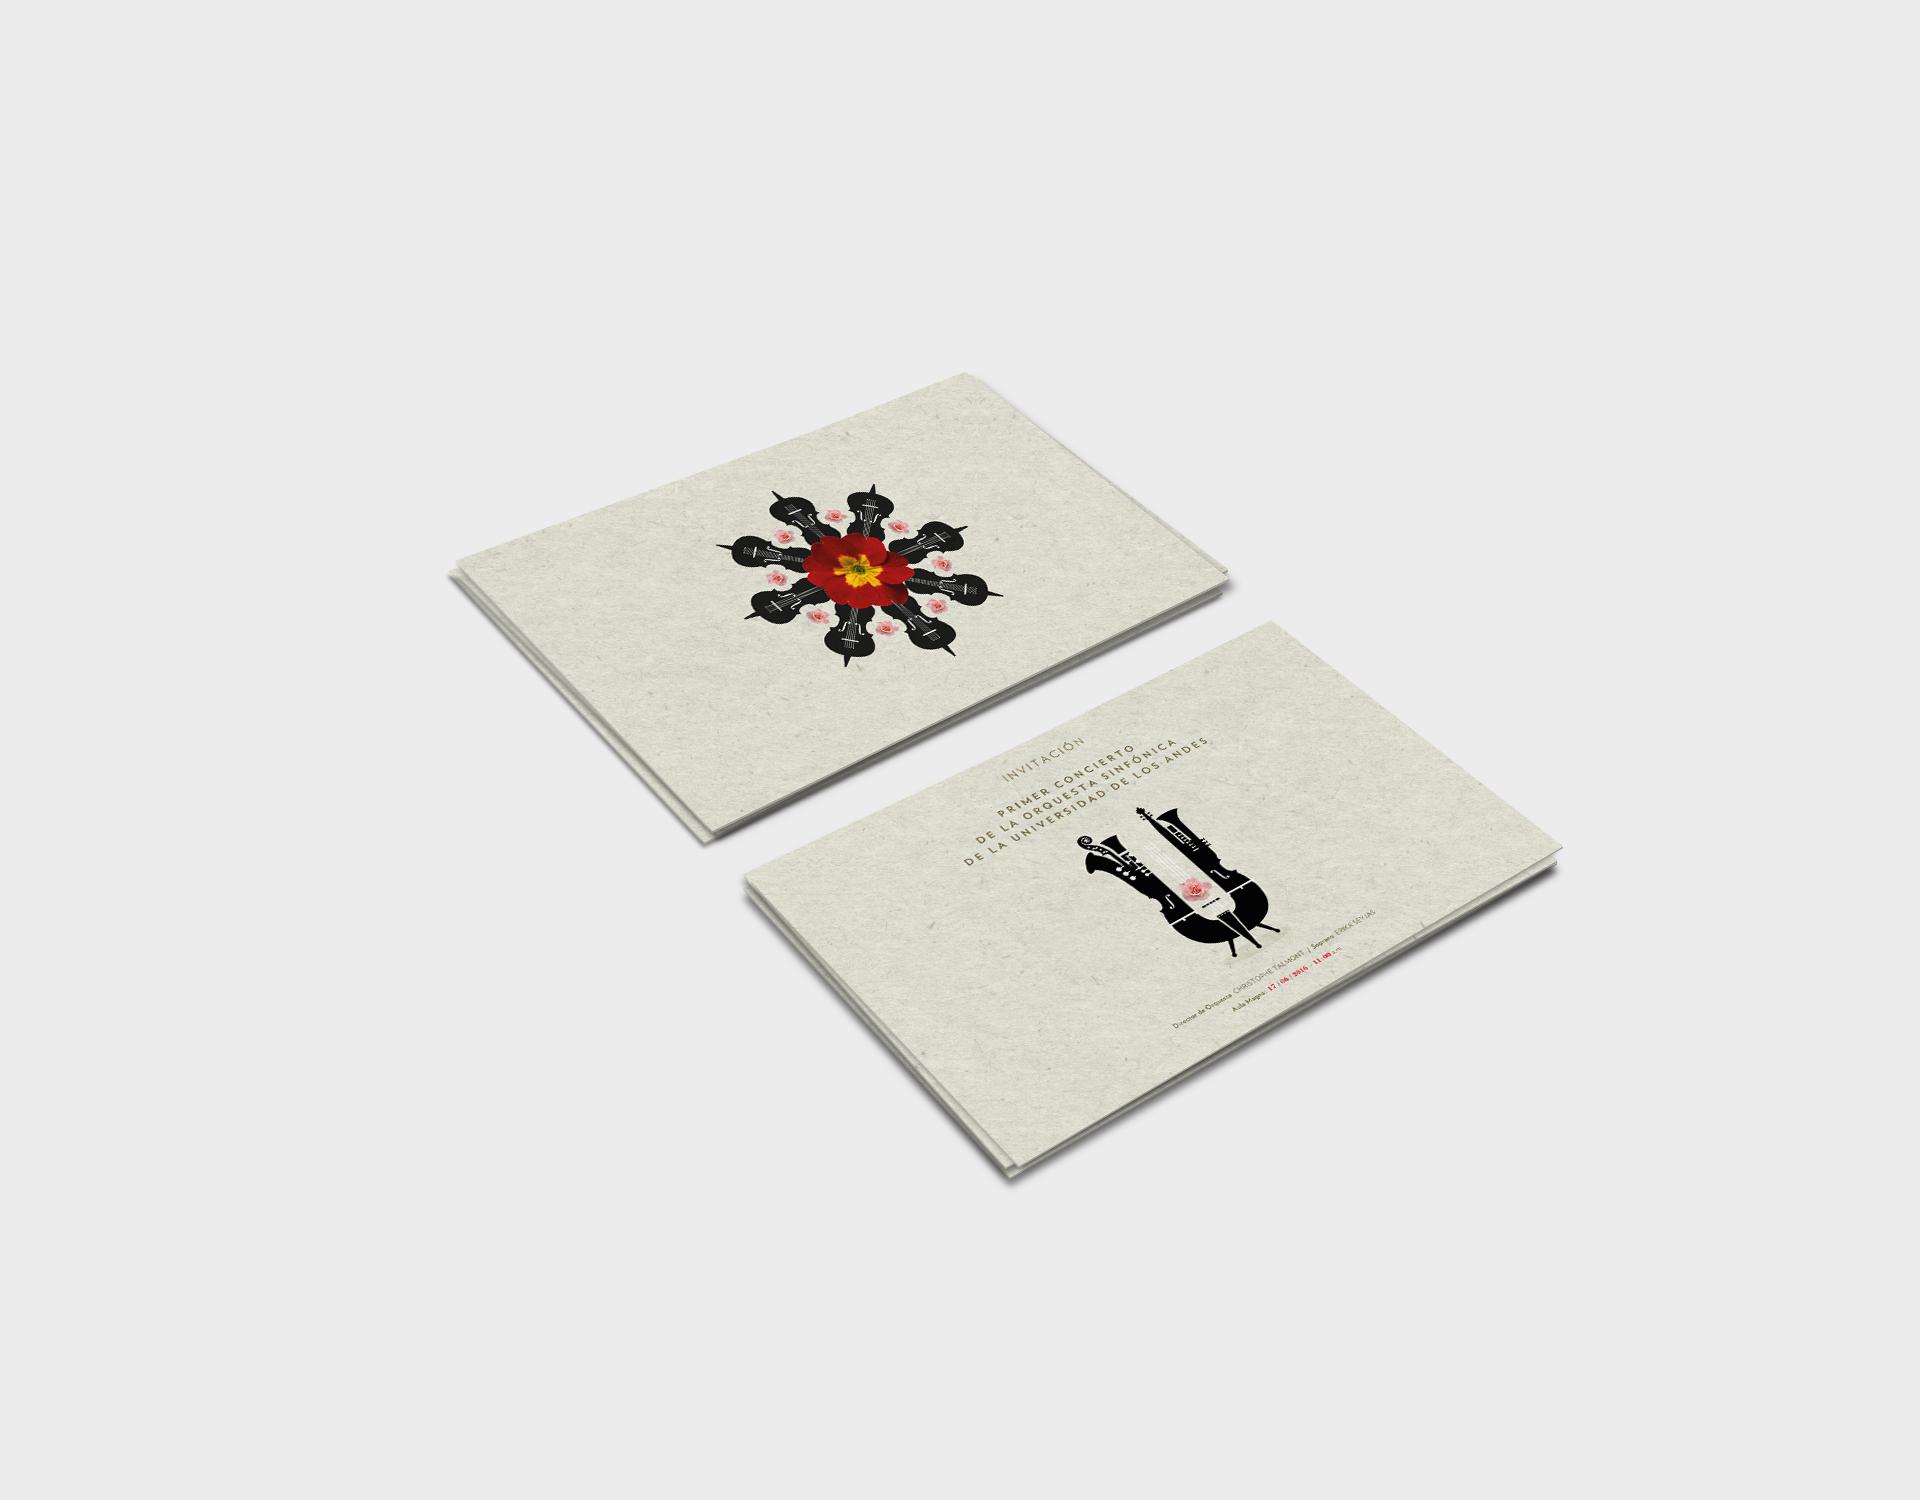 jhonatan-medina-caguana_concierto_tarjeta-copia